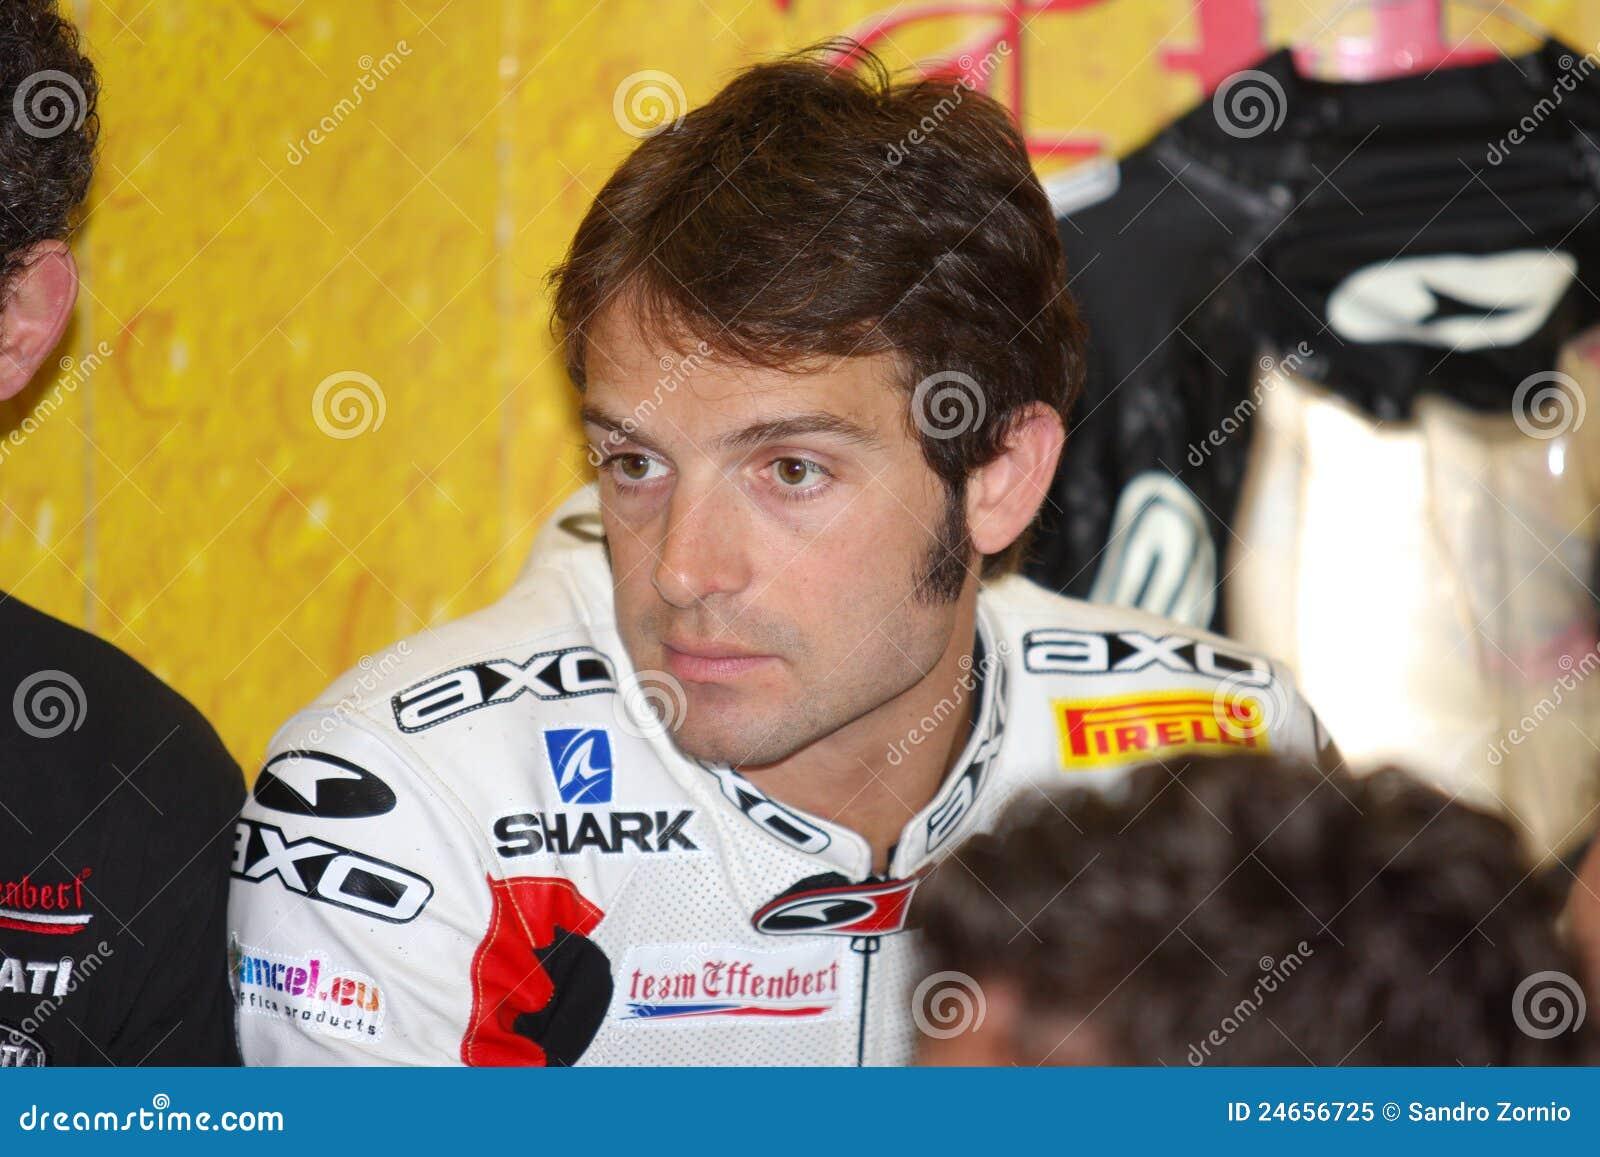 Sylvain Guintoli - Ducati1098R - Effenbert Liberty